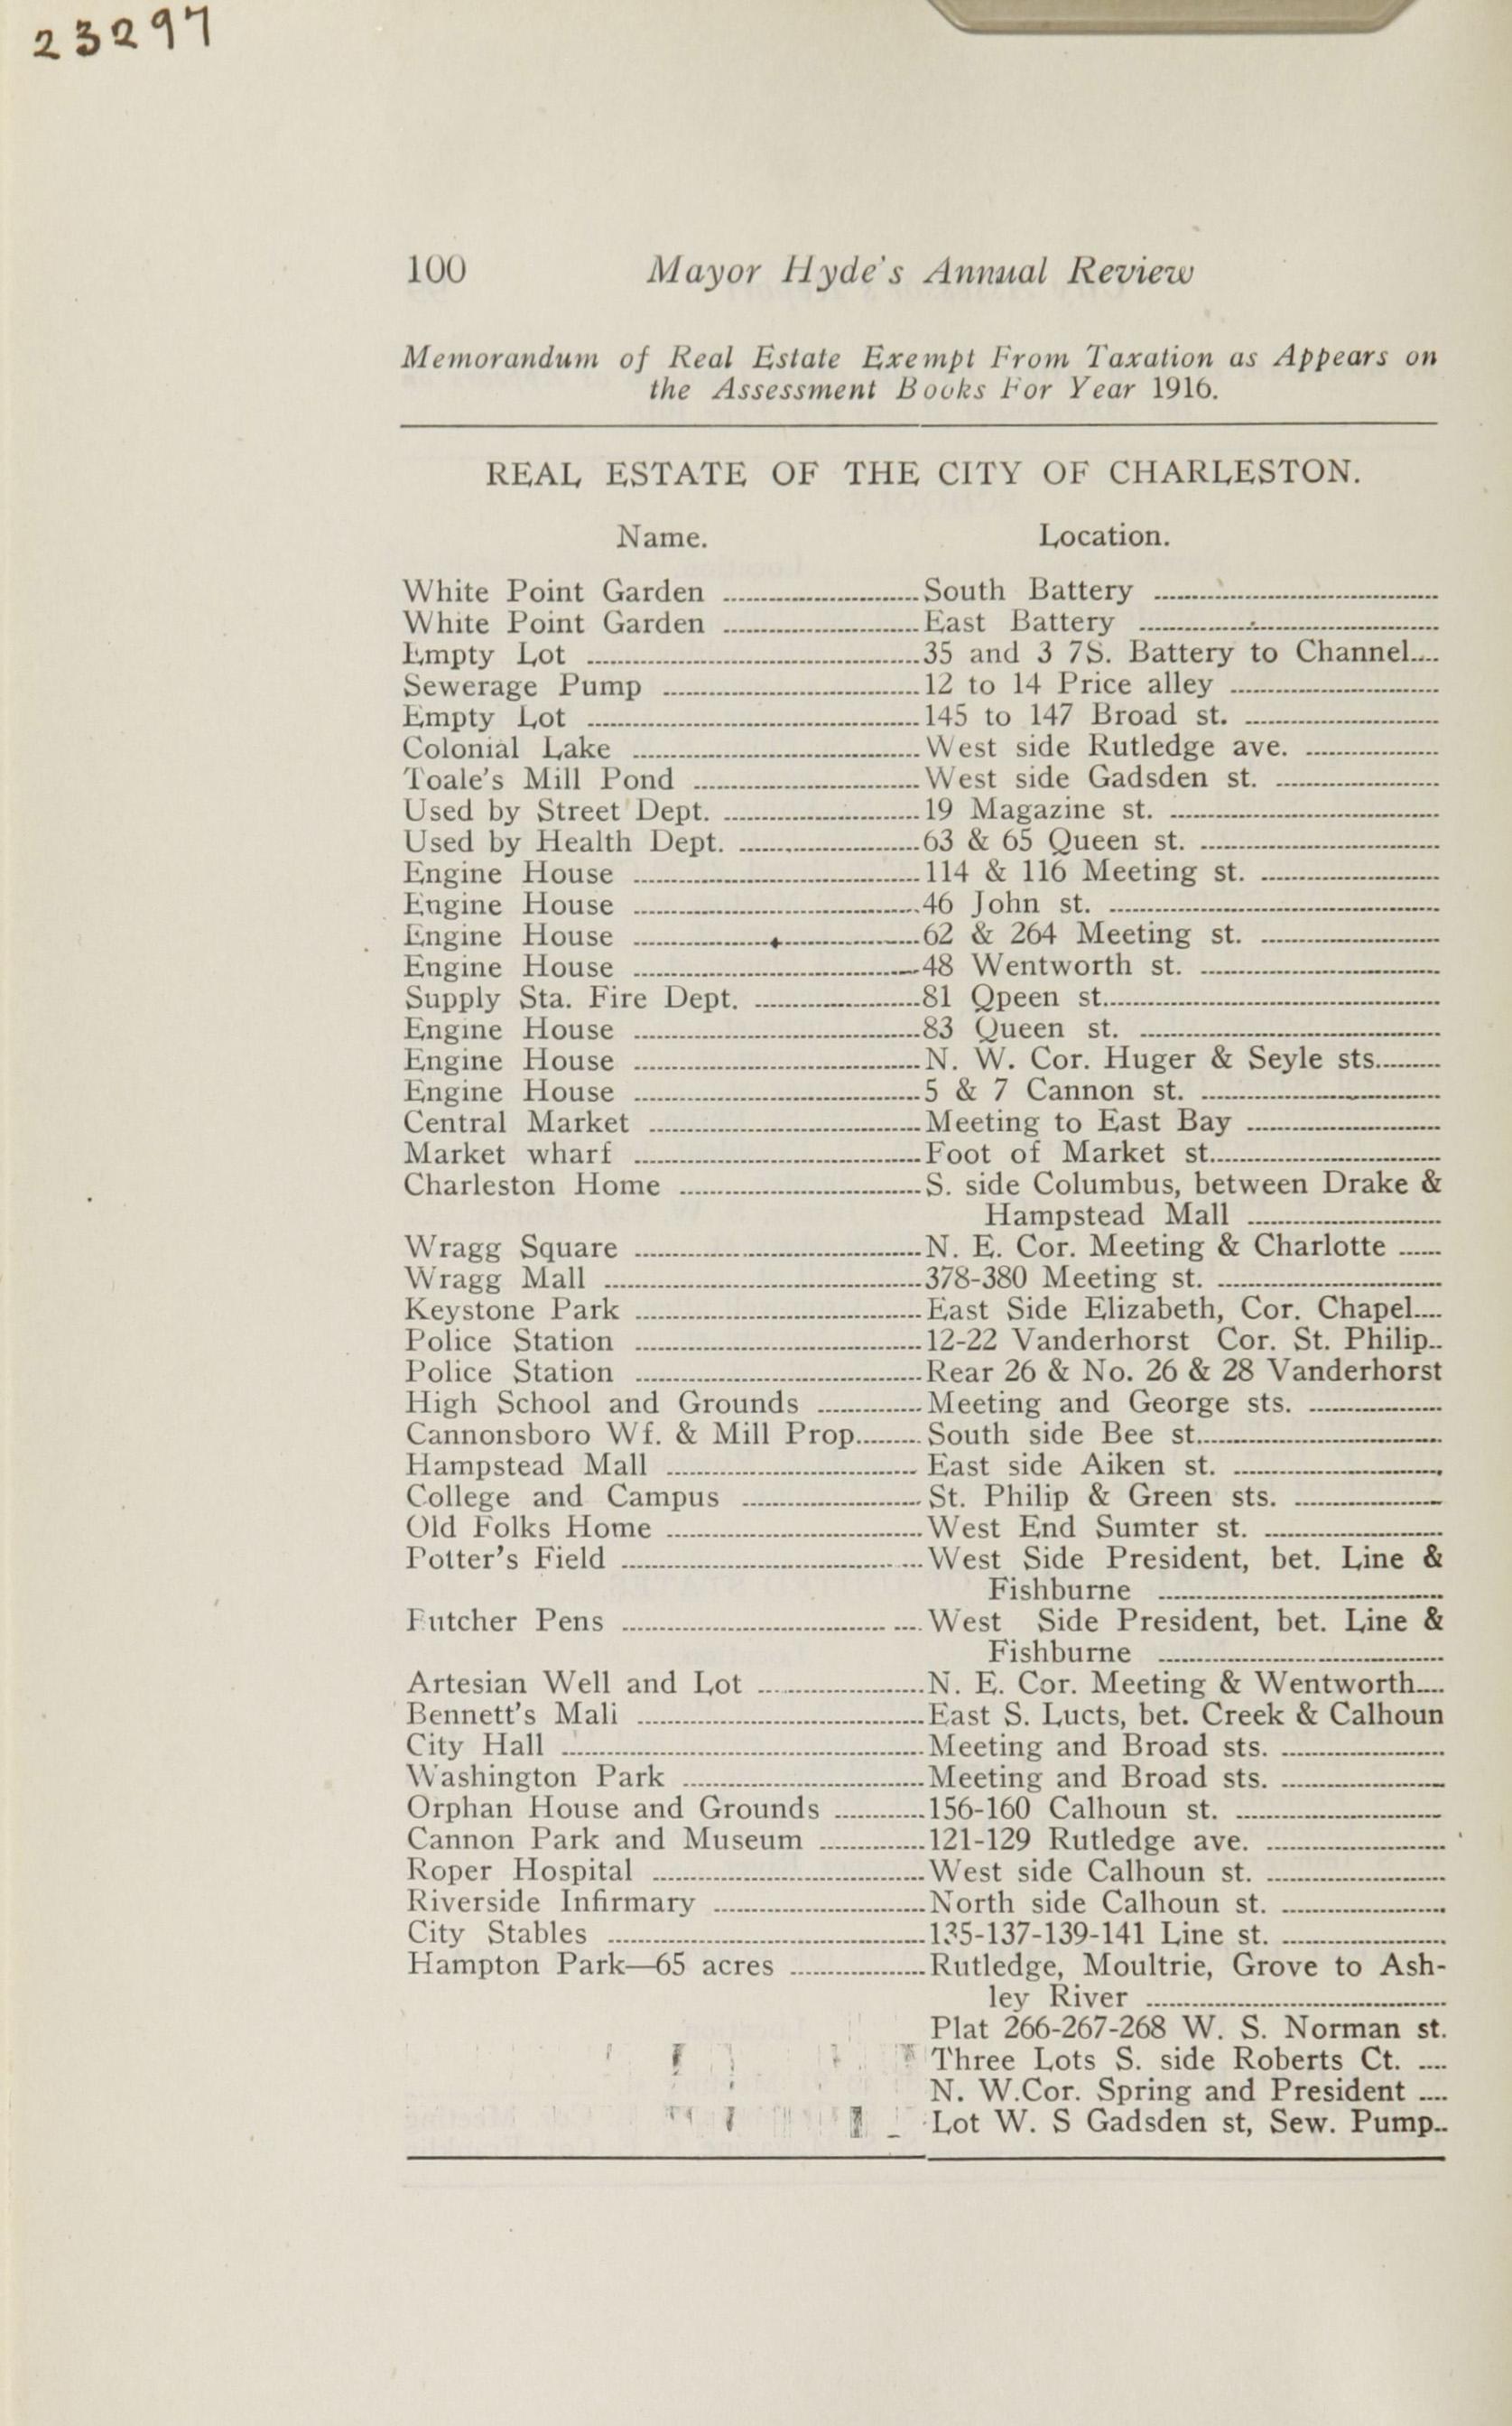 Charleston Yearbook, 1916, page 100